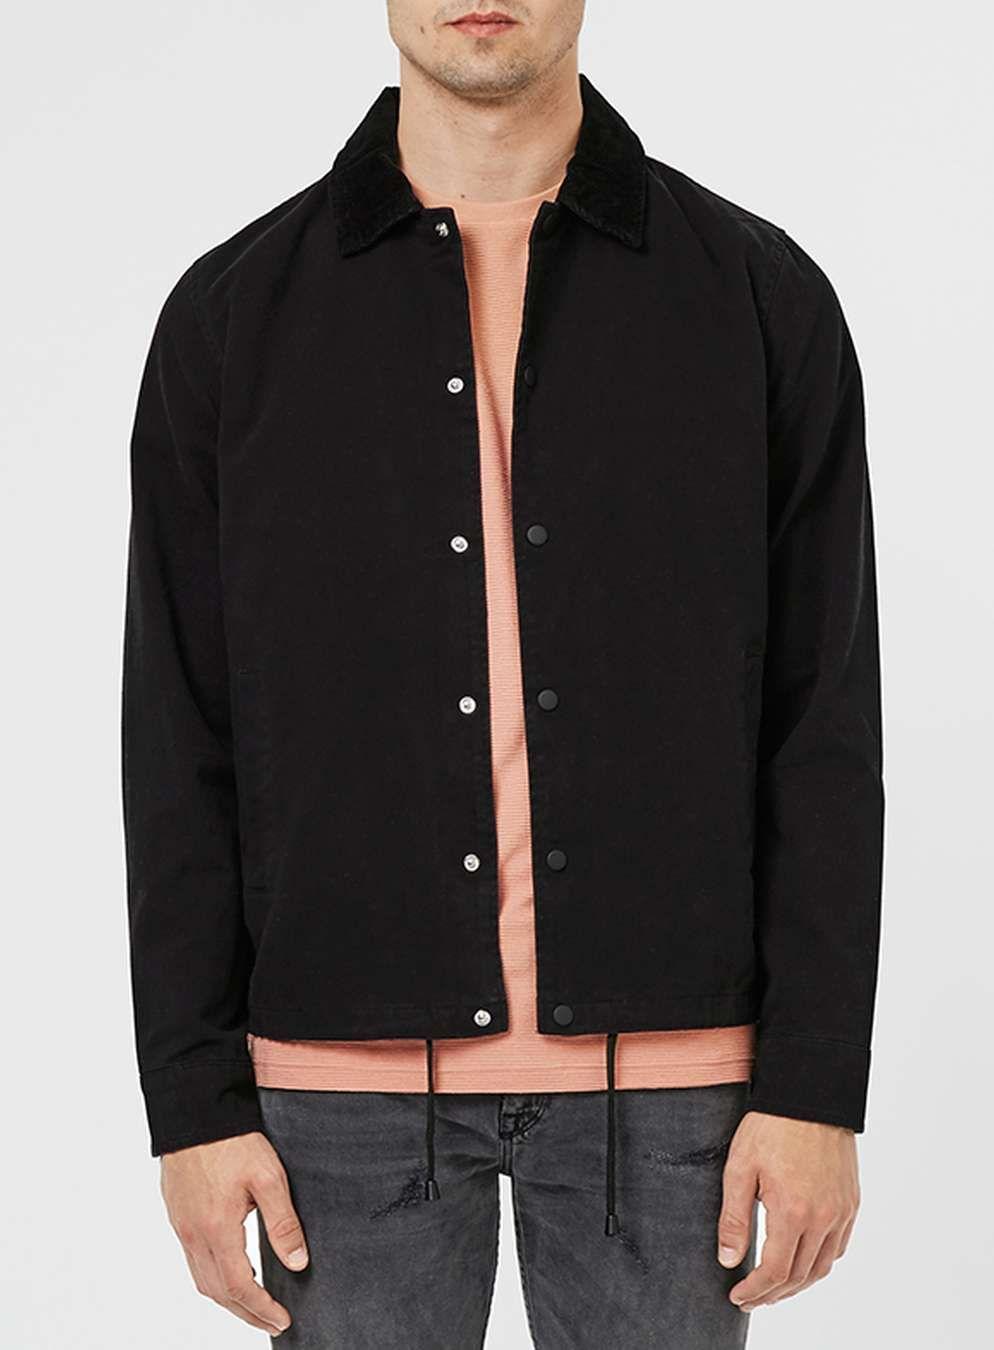 Black Cord Collar Coach Jacket Mens Coats Jackets Clothing